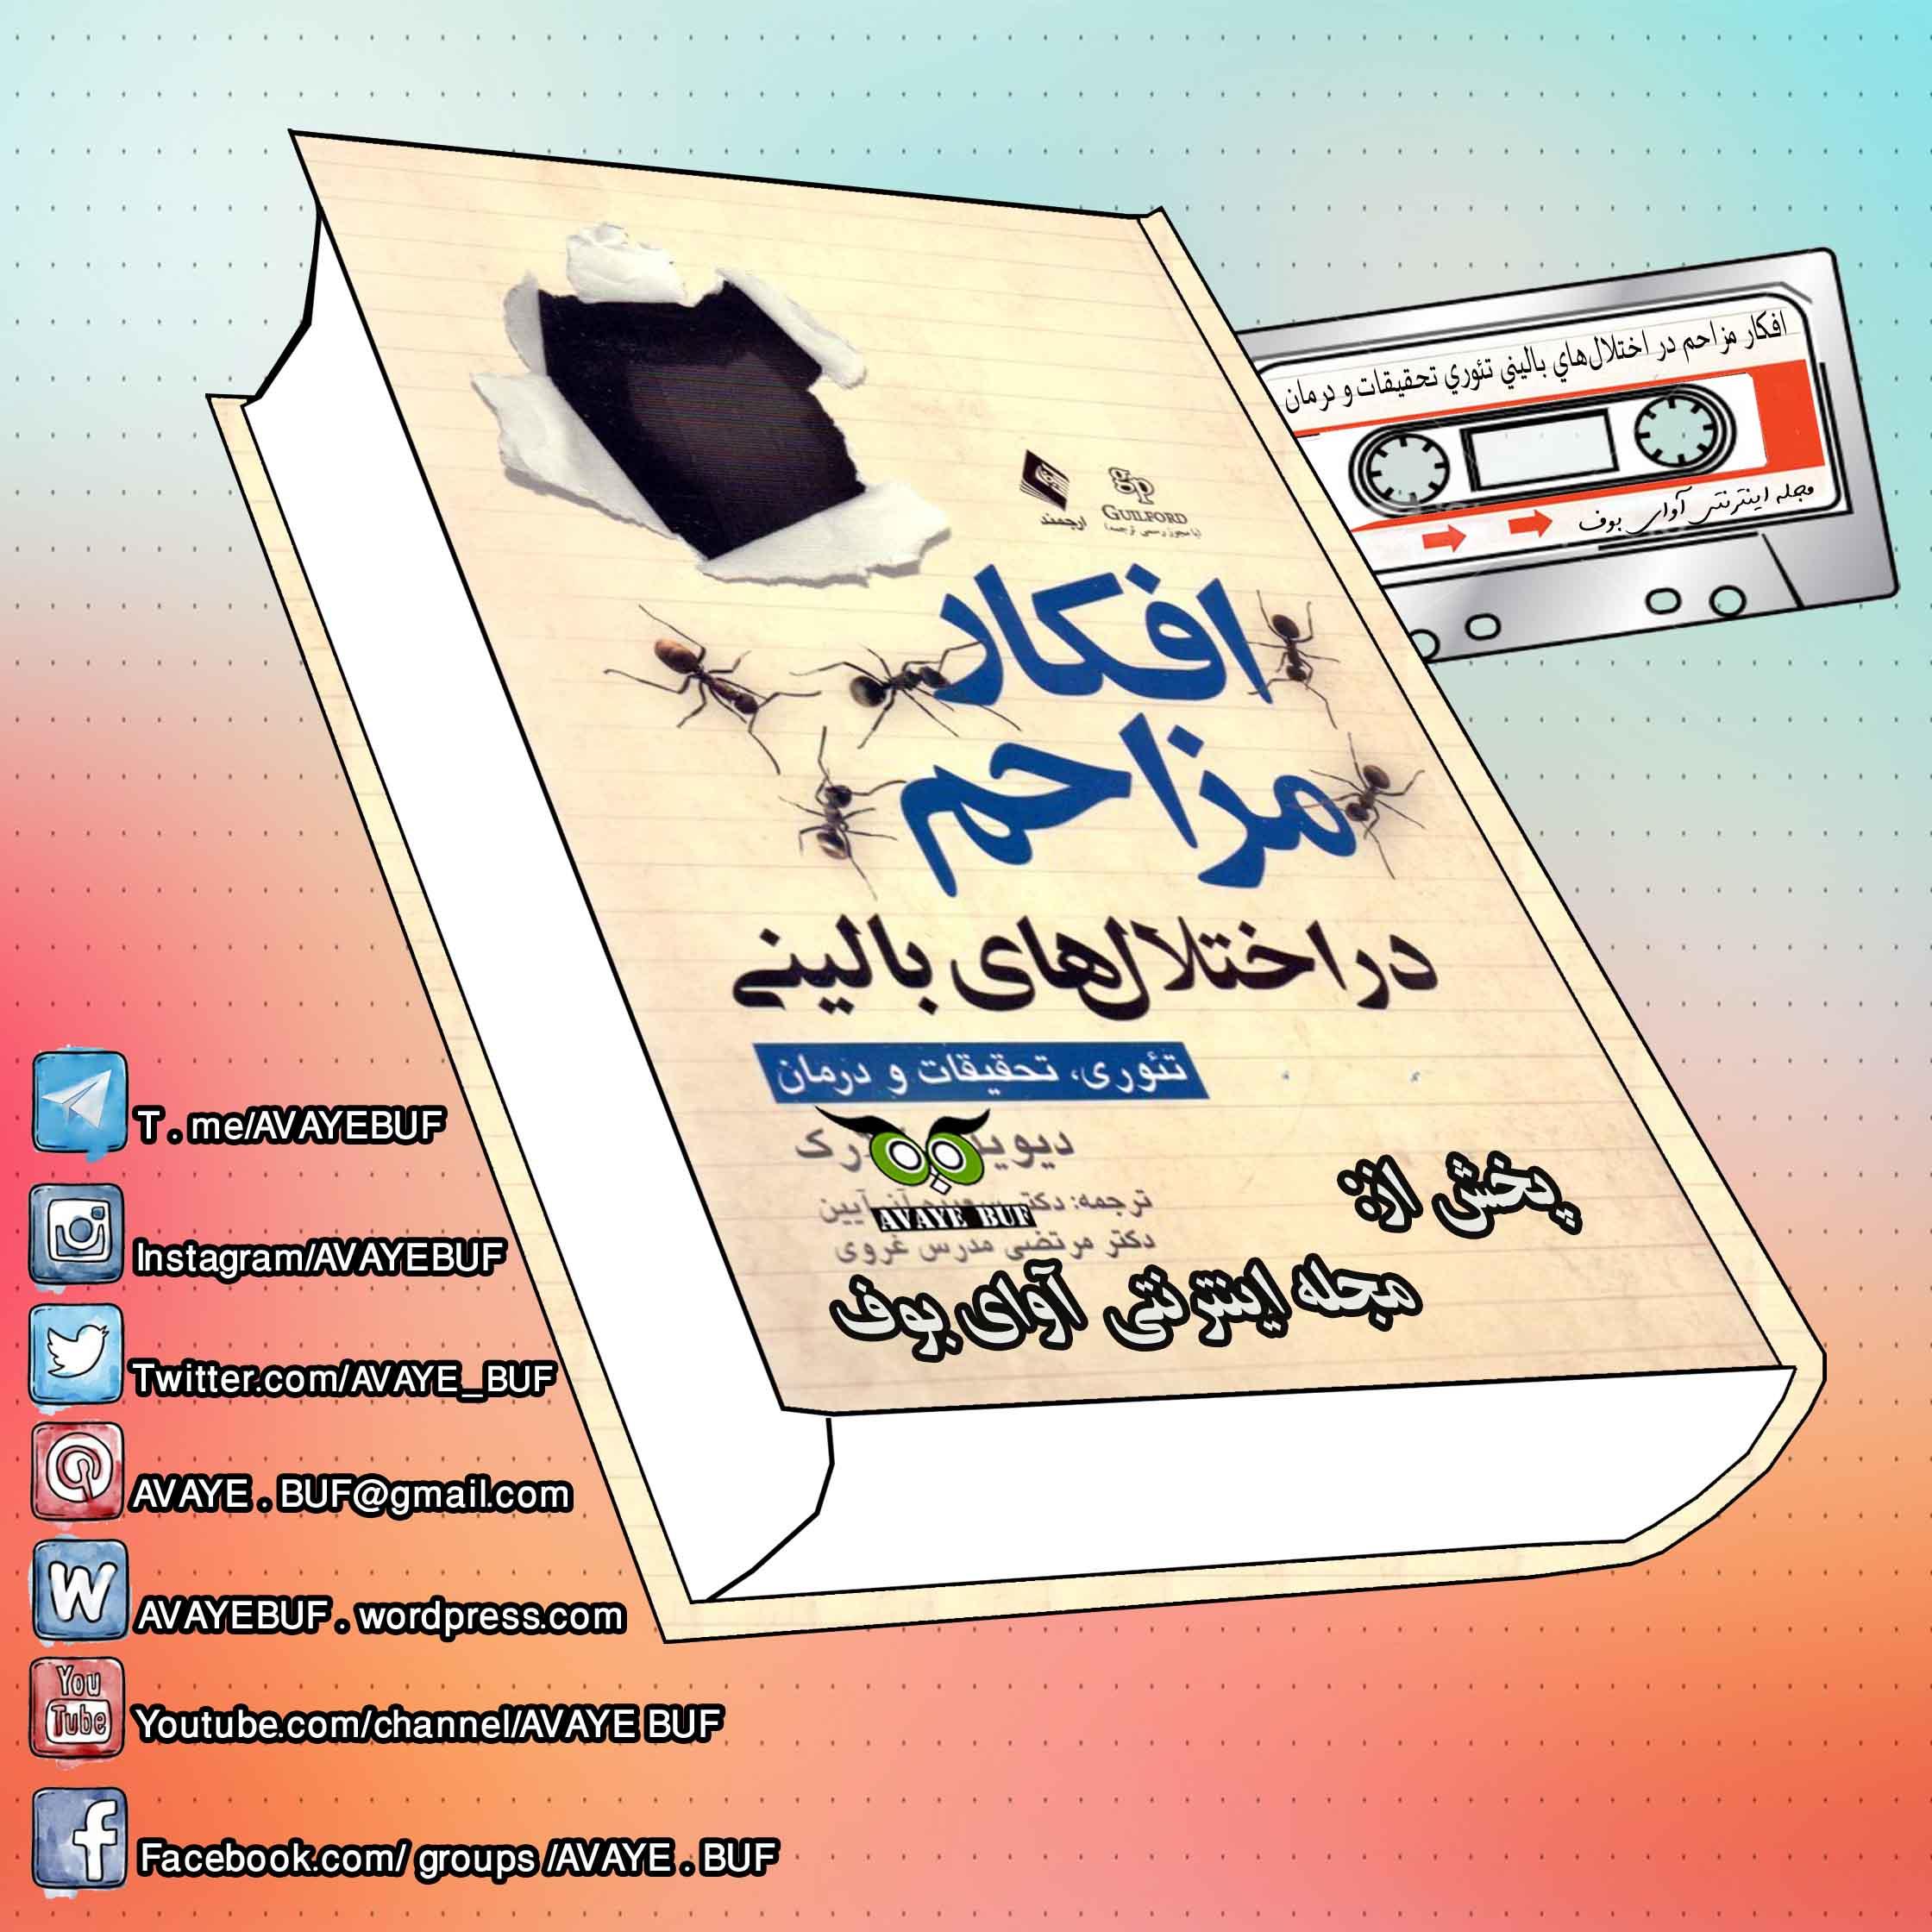 _Afkare_Mozahem_Dar_Ekhtelalhaye_AVAYeBUF_Wordpress_Com